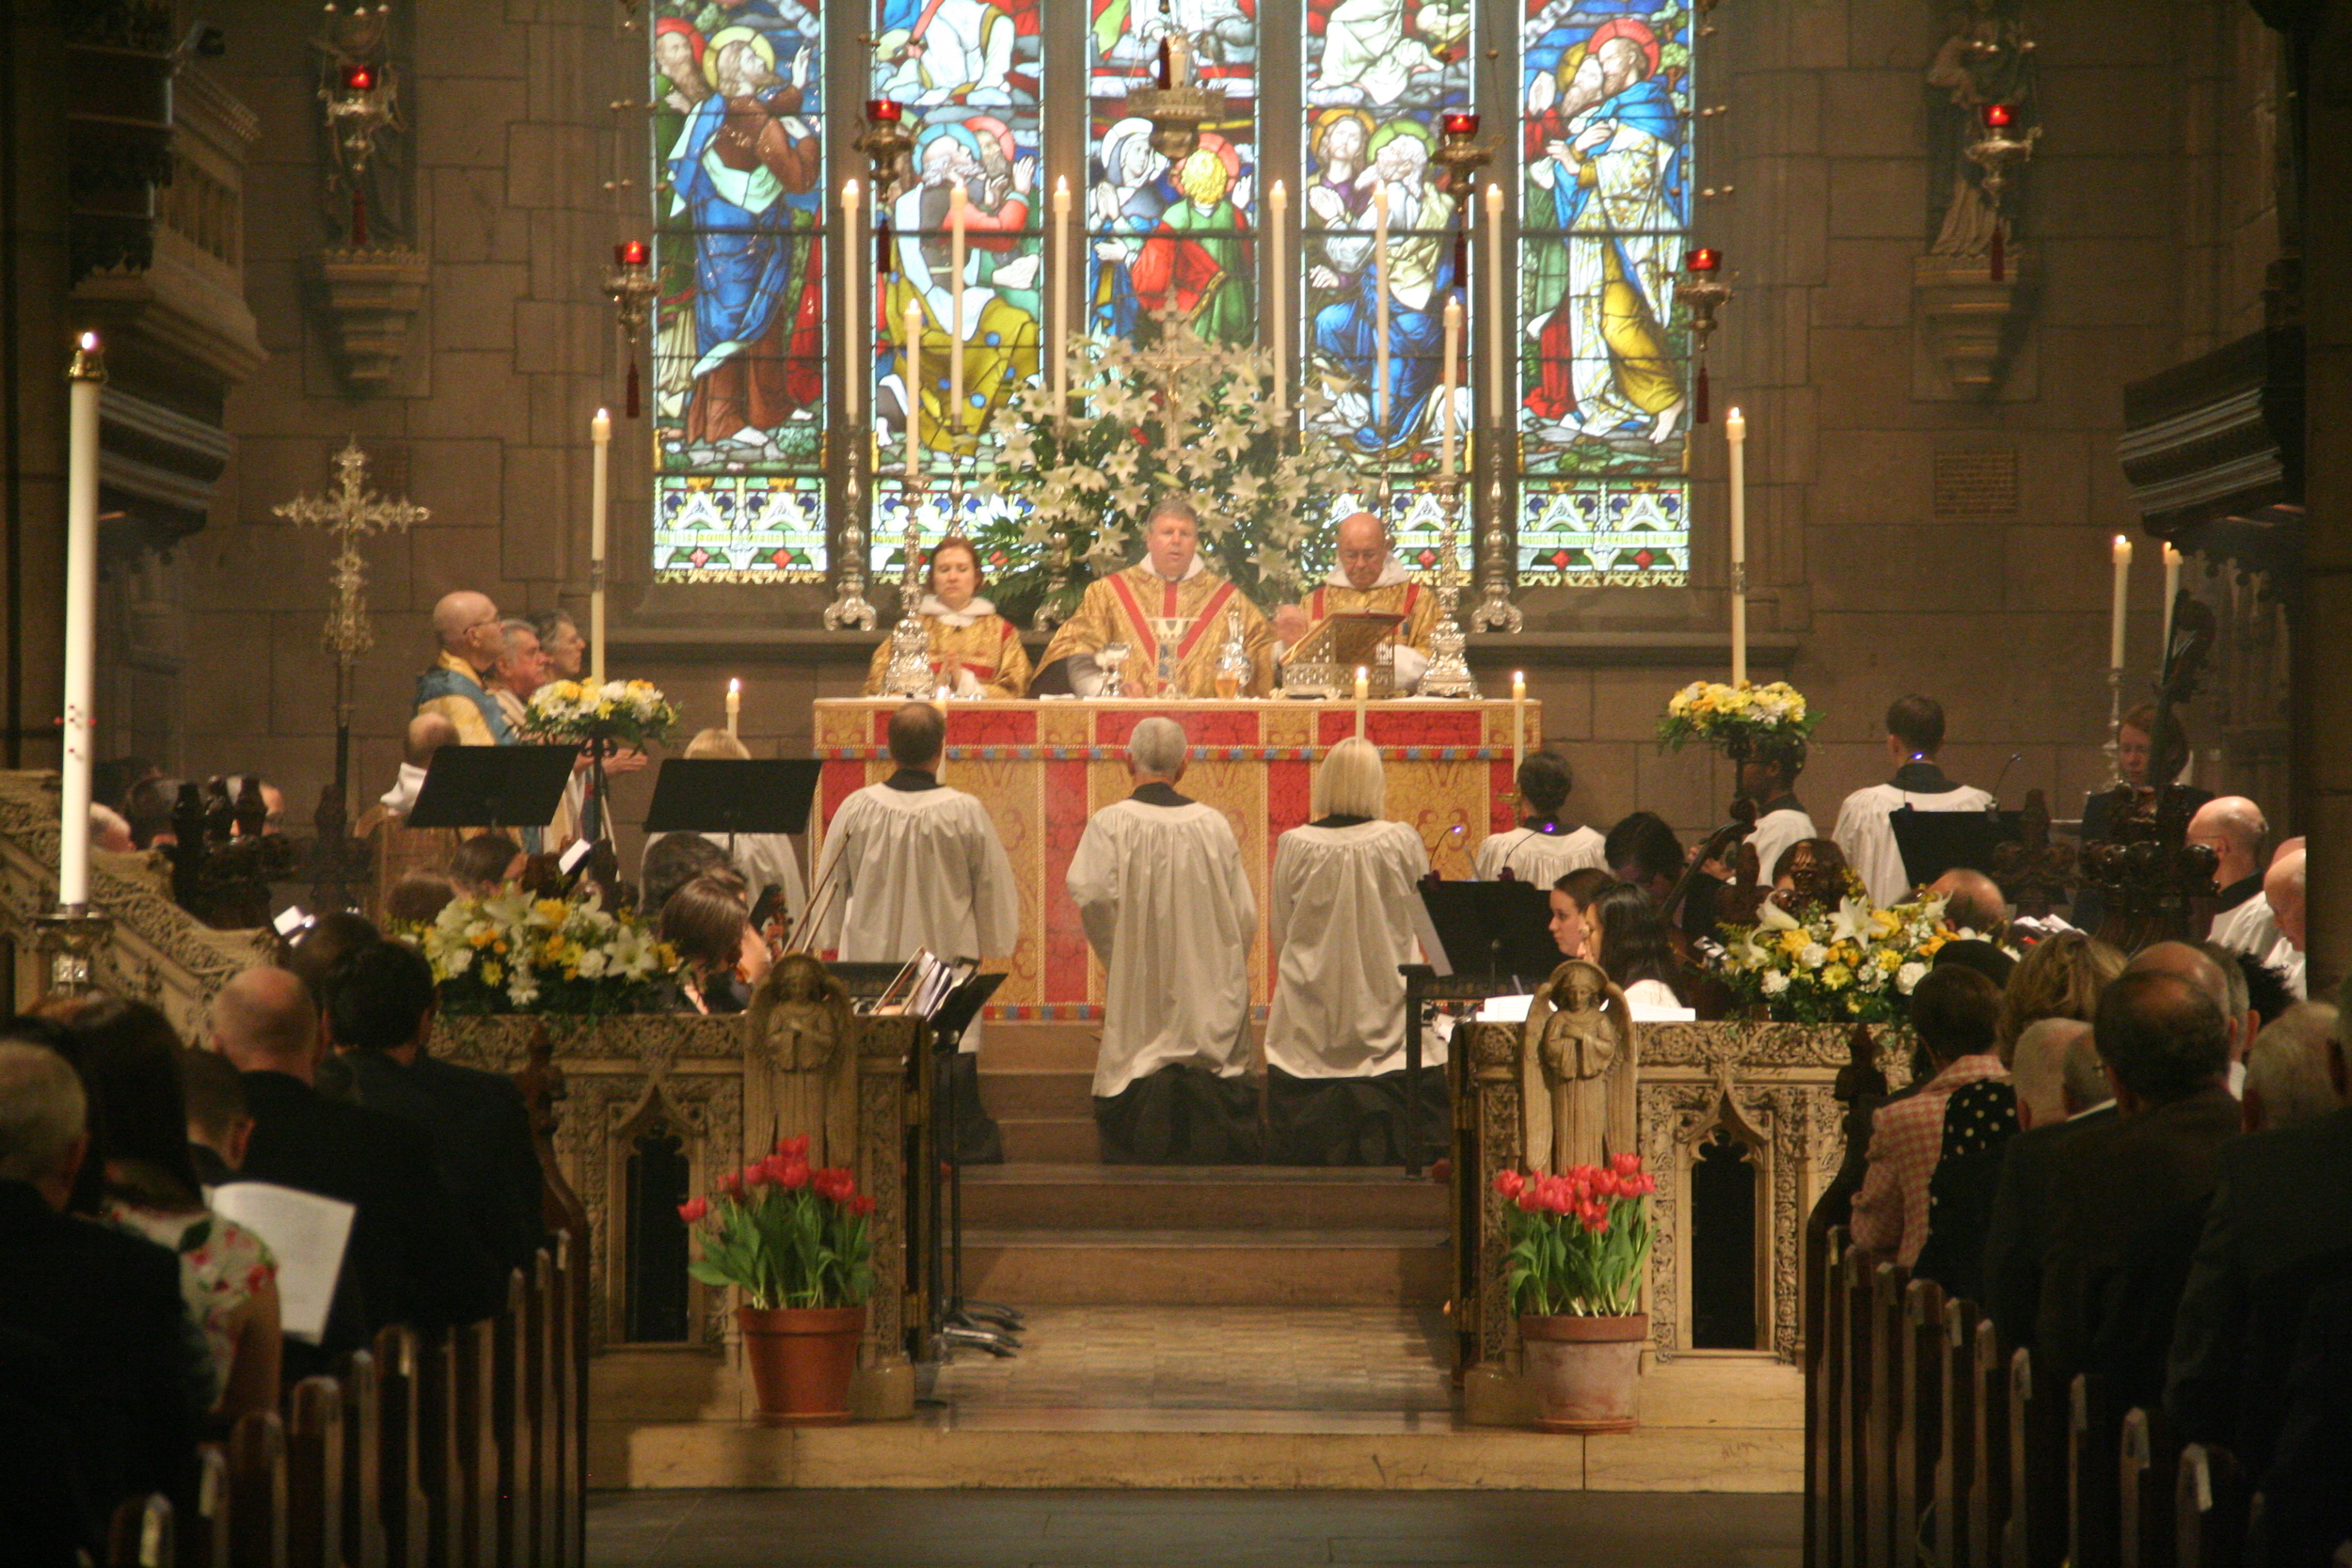 HIgh Mass on Easter morning